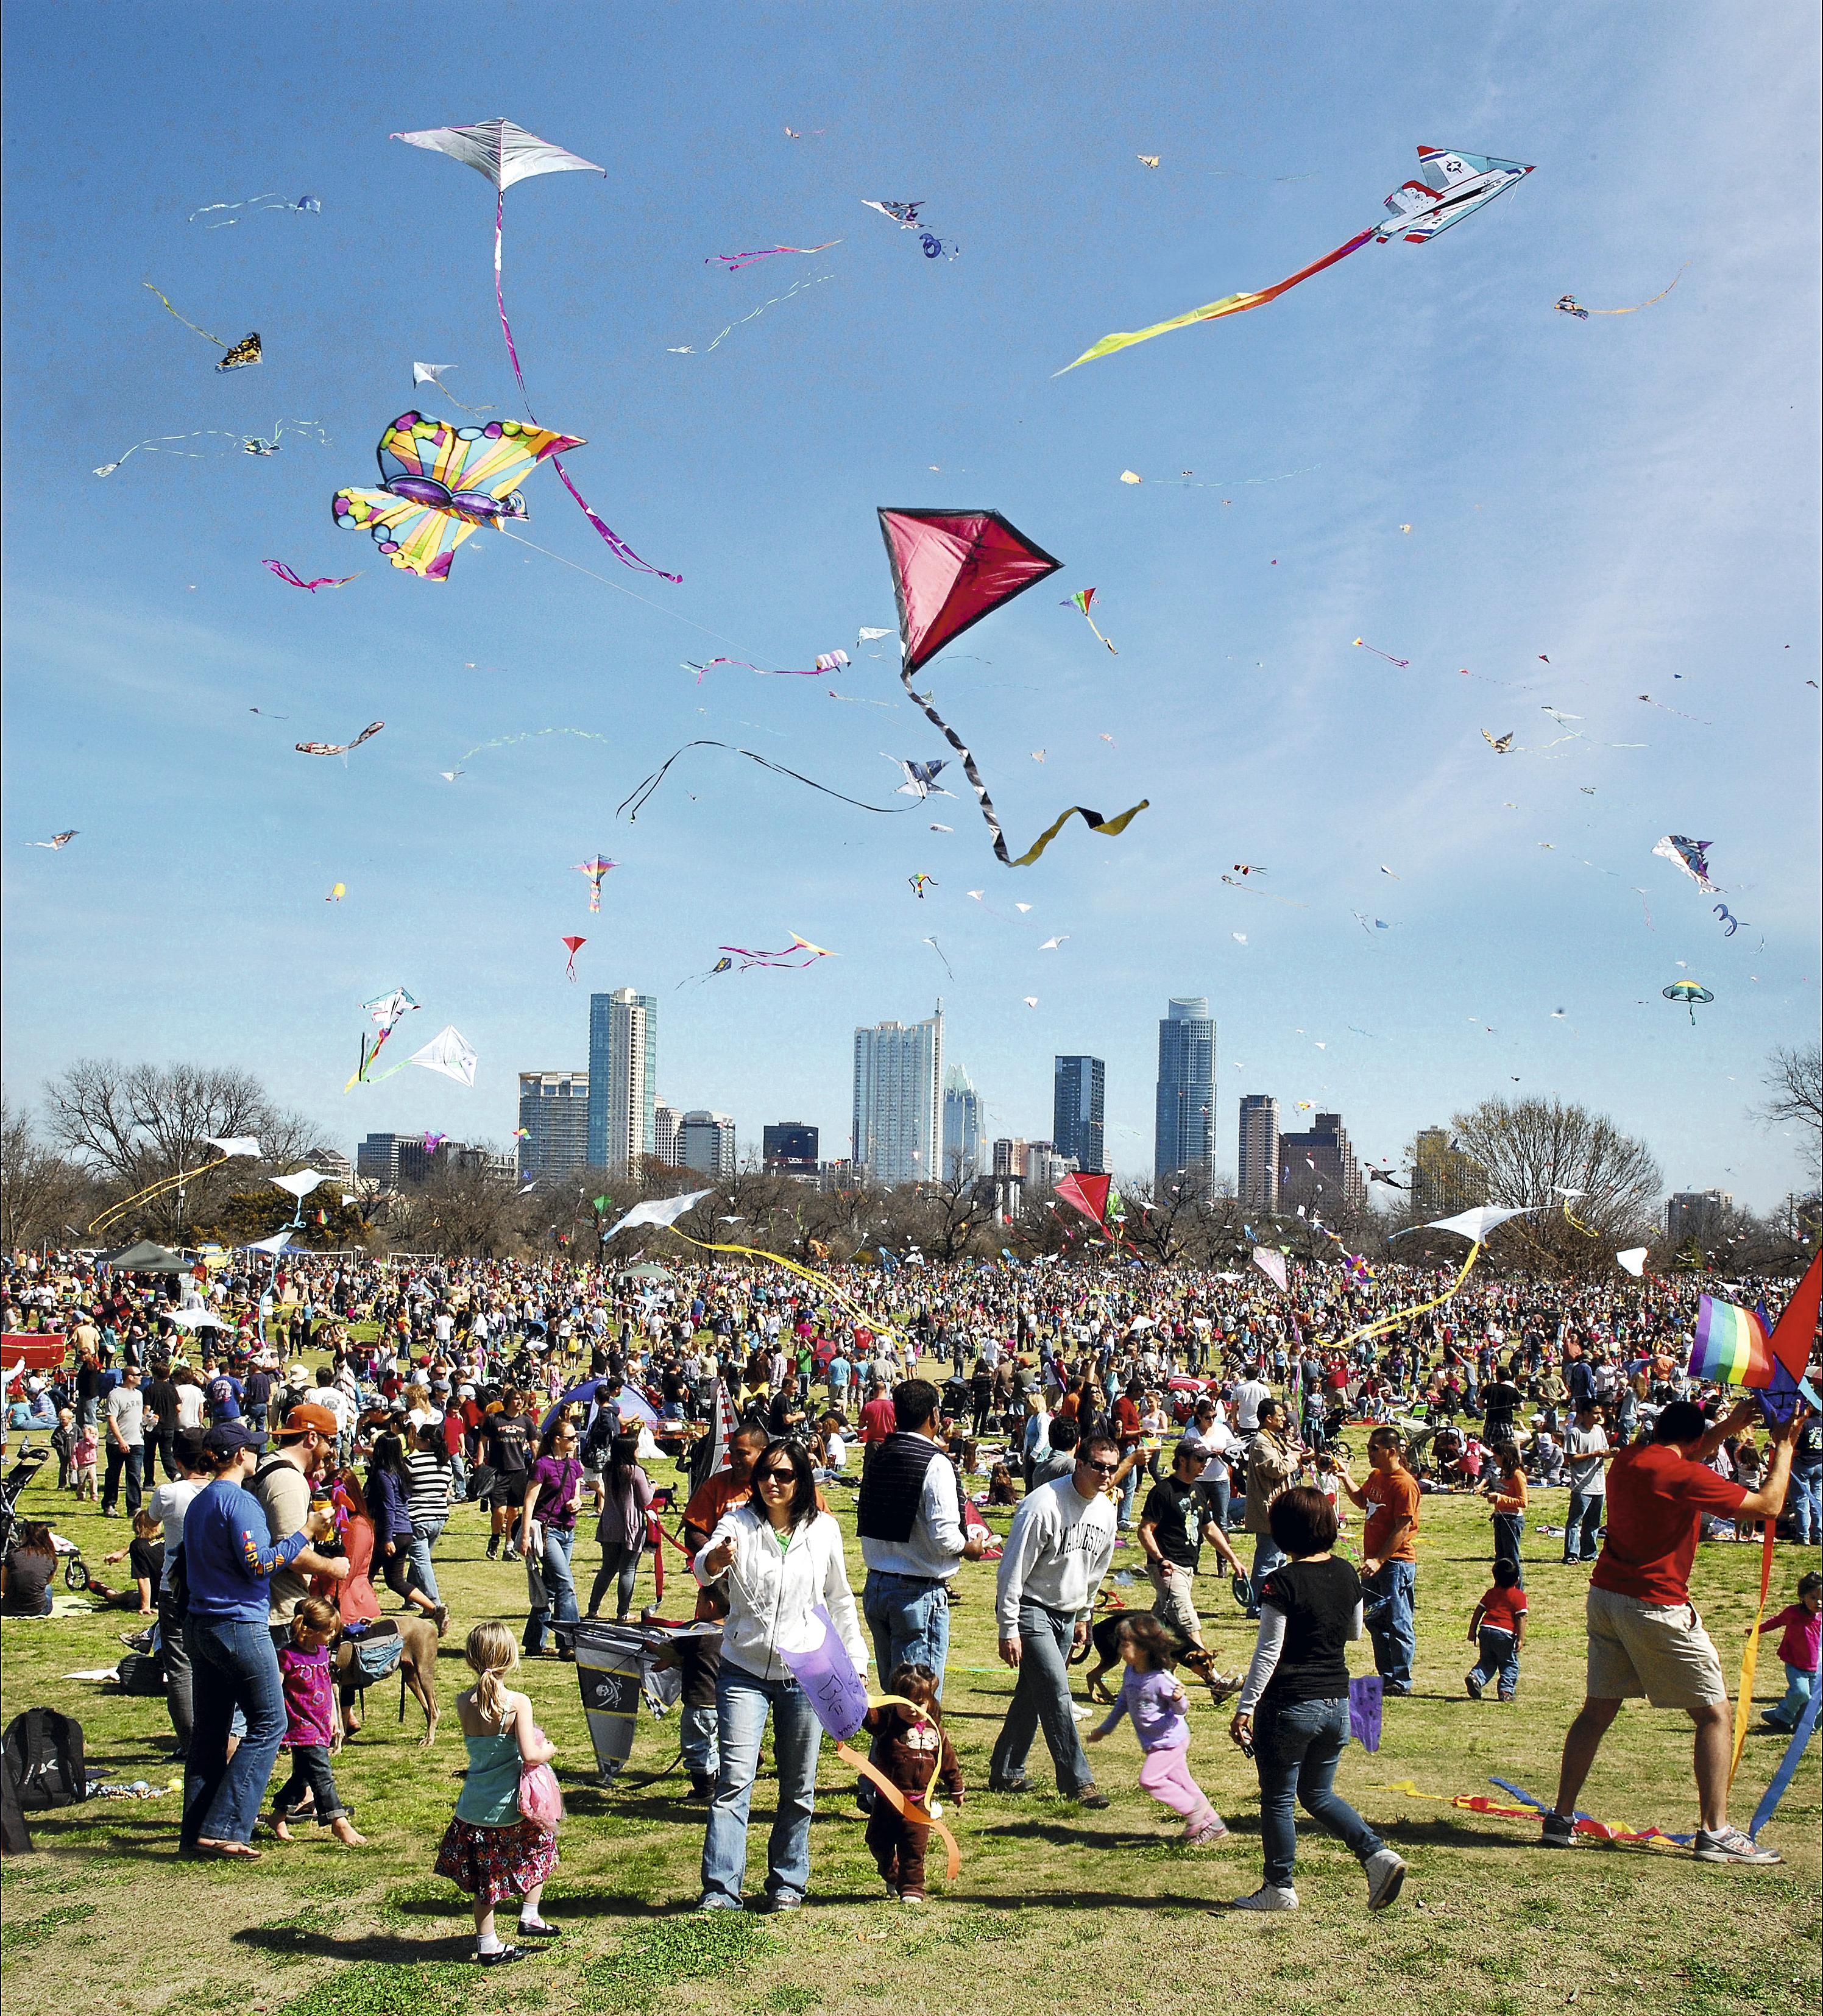 Festival de pipas, Austin, Texas